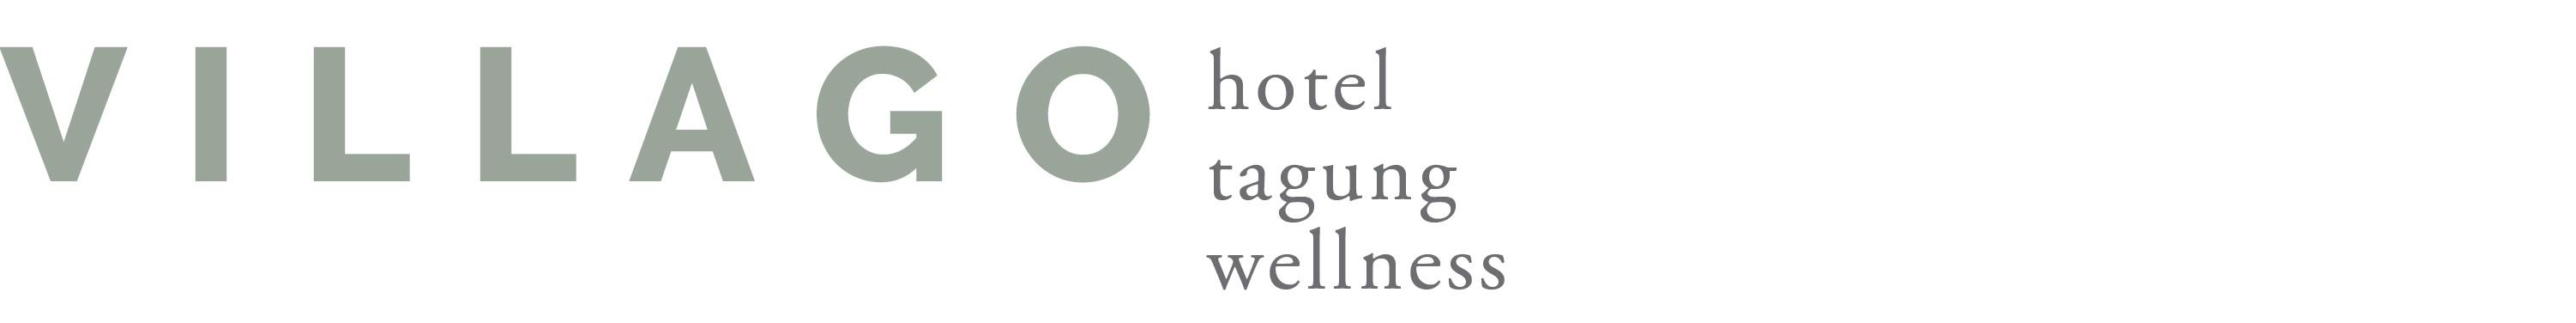 VILLAGO Hotel, Logo